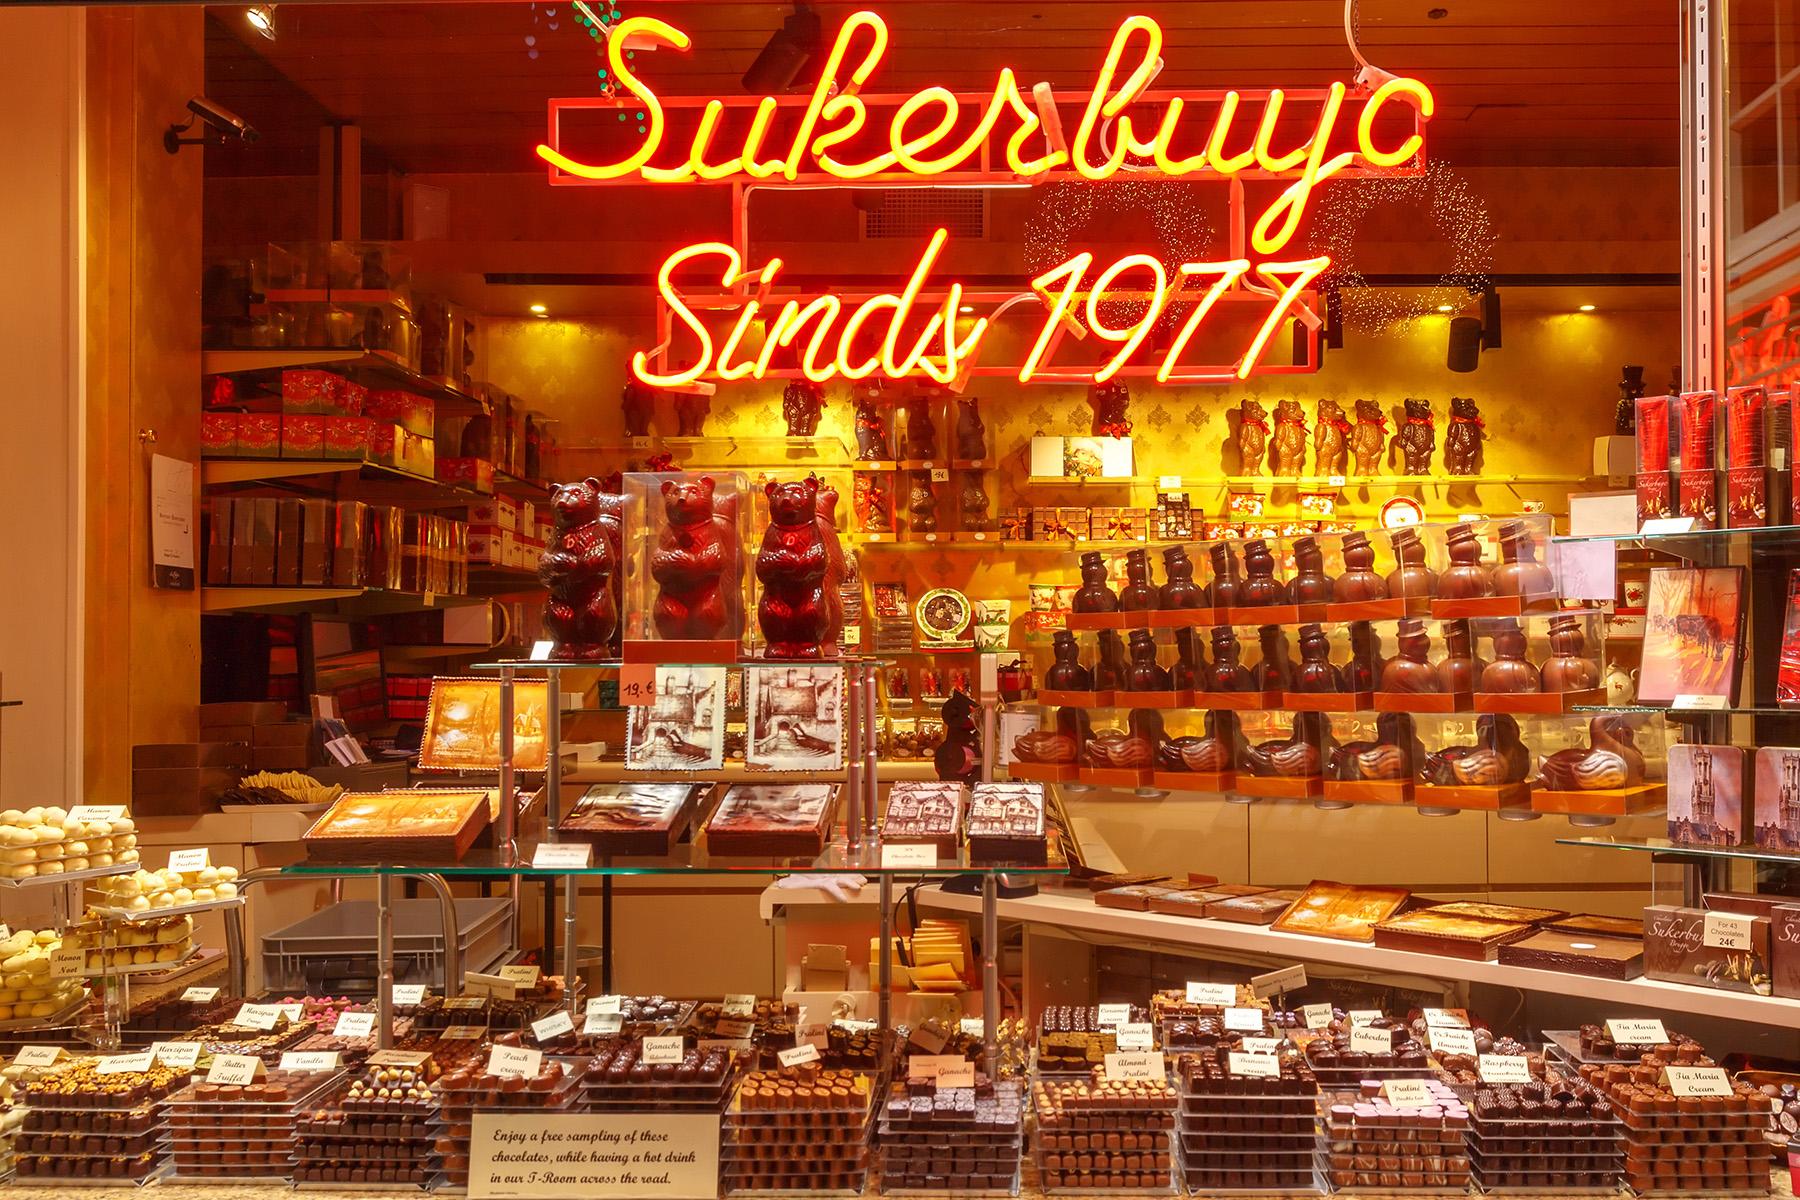 A Belgian chocolate shop